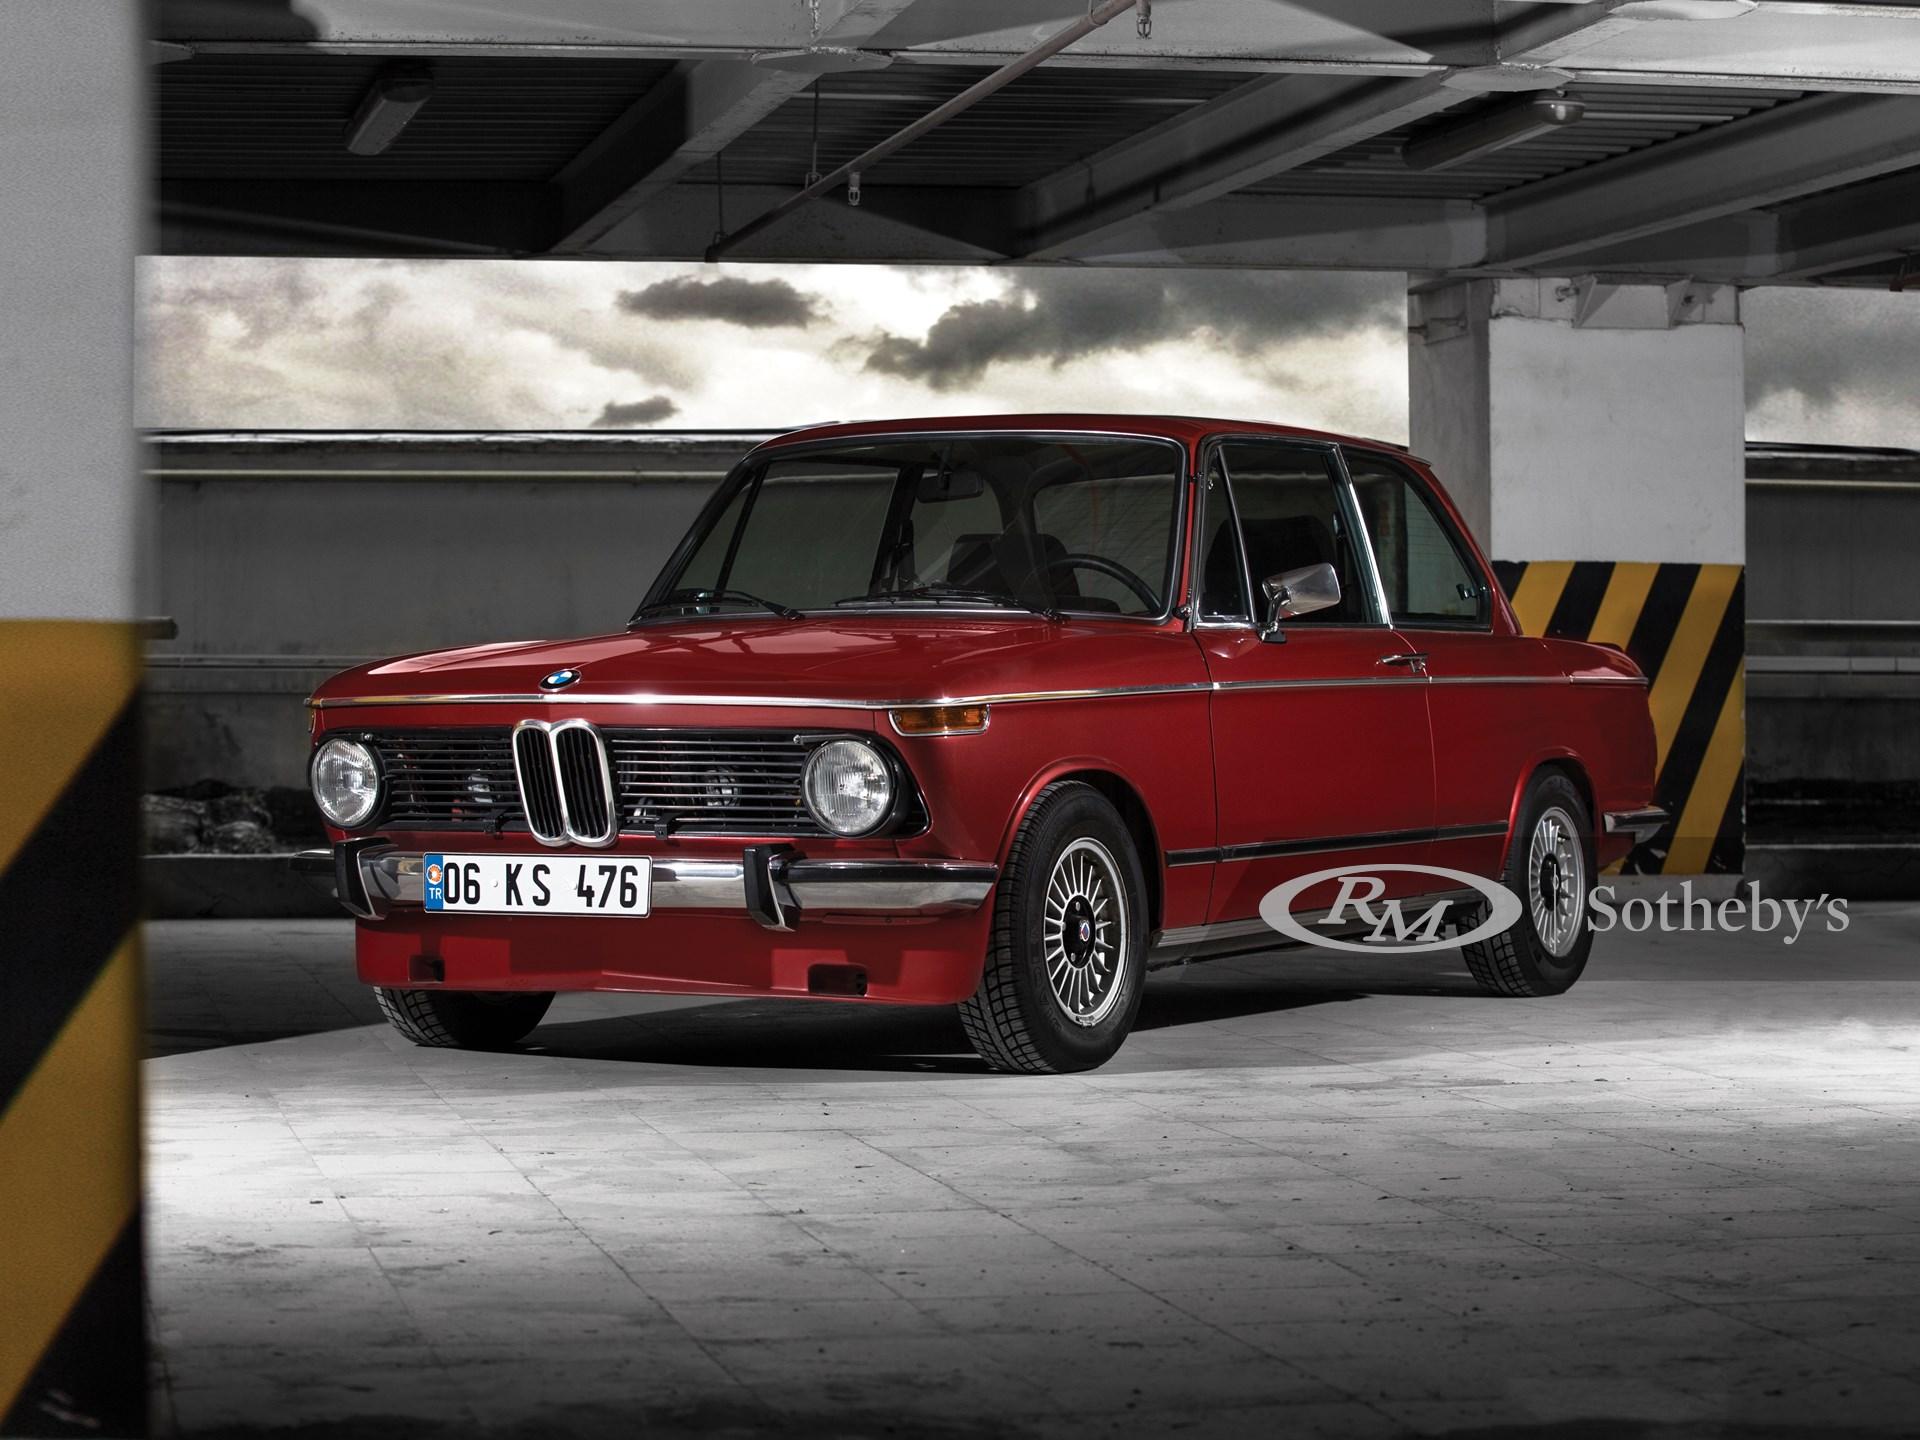 1974 Bmw 2002 Tii Alpina A4s Paris 2017 Rm Sotheby S